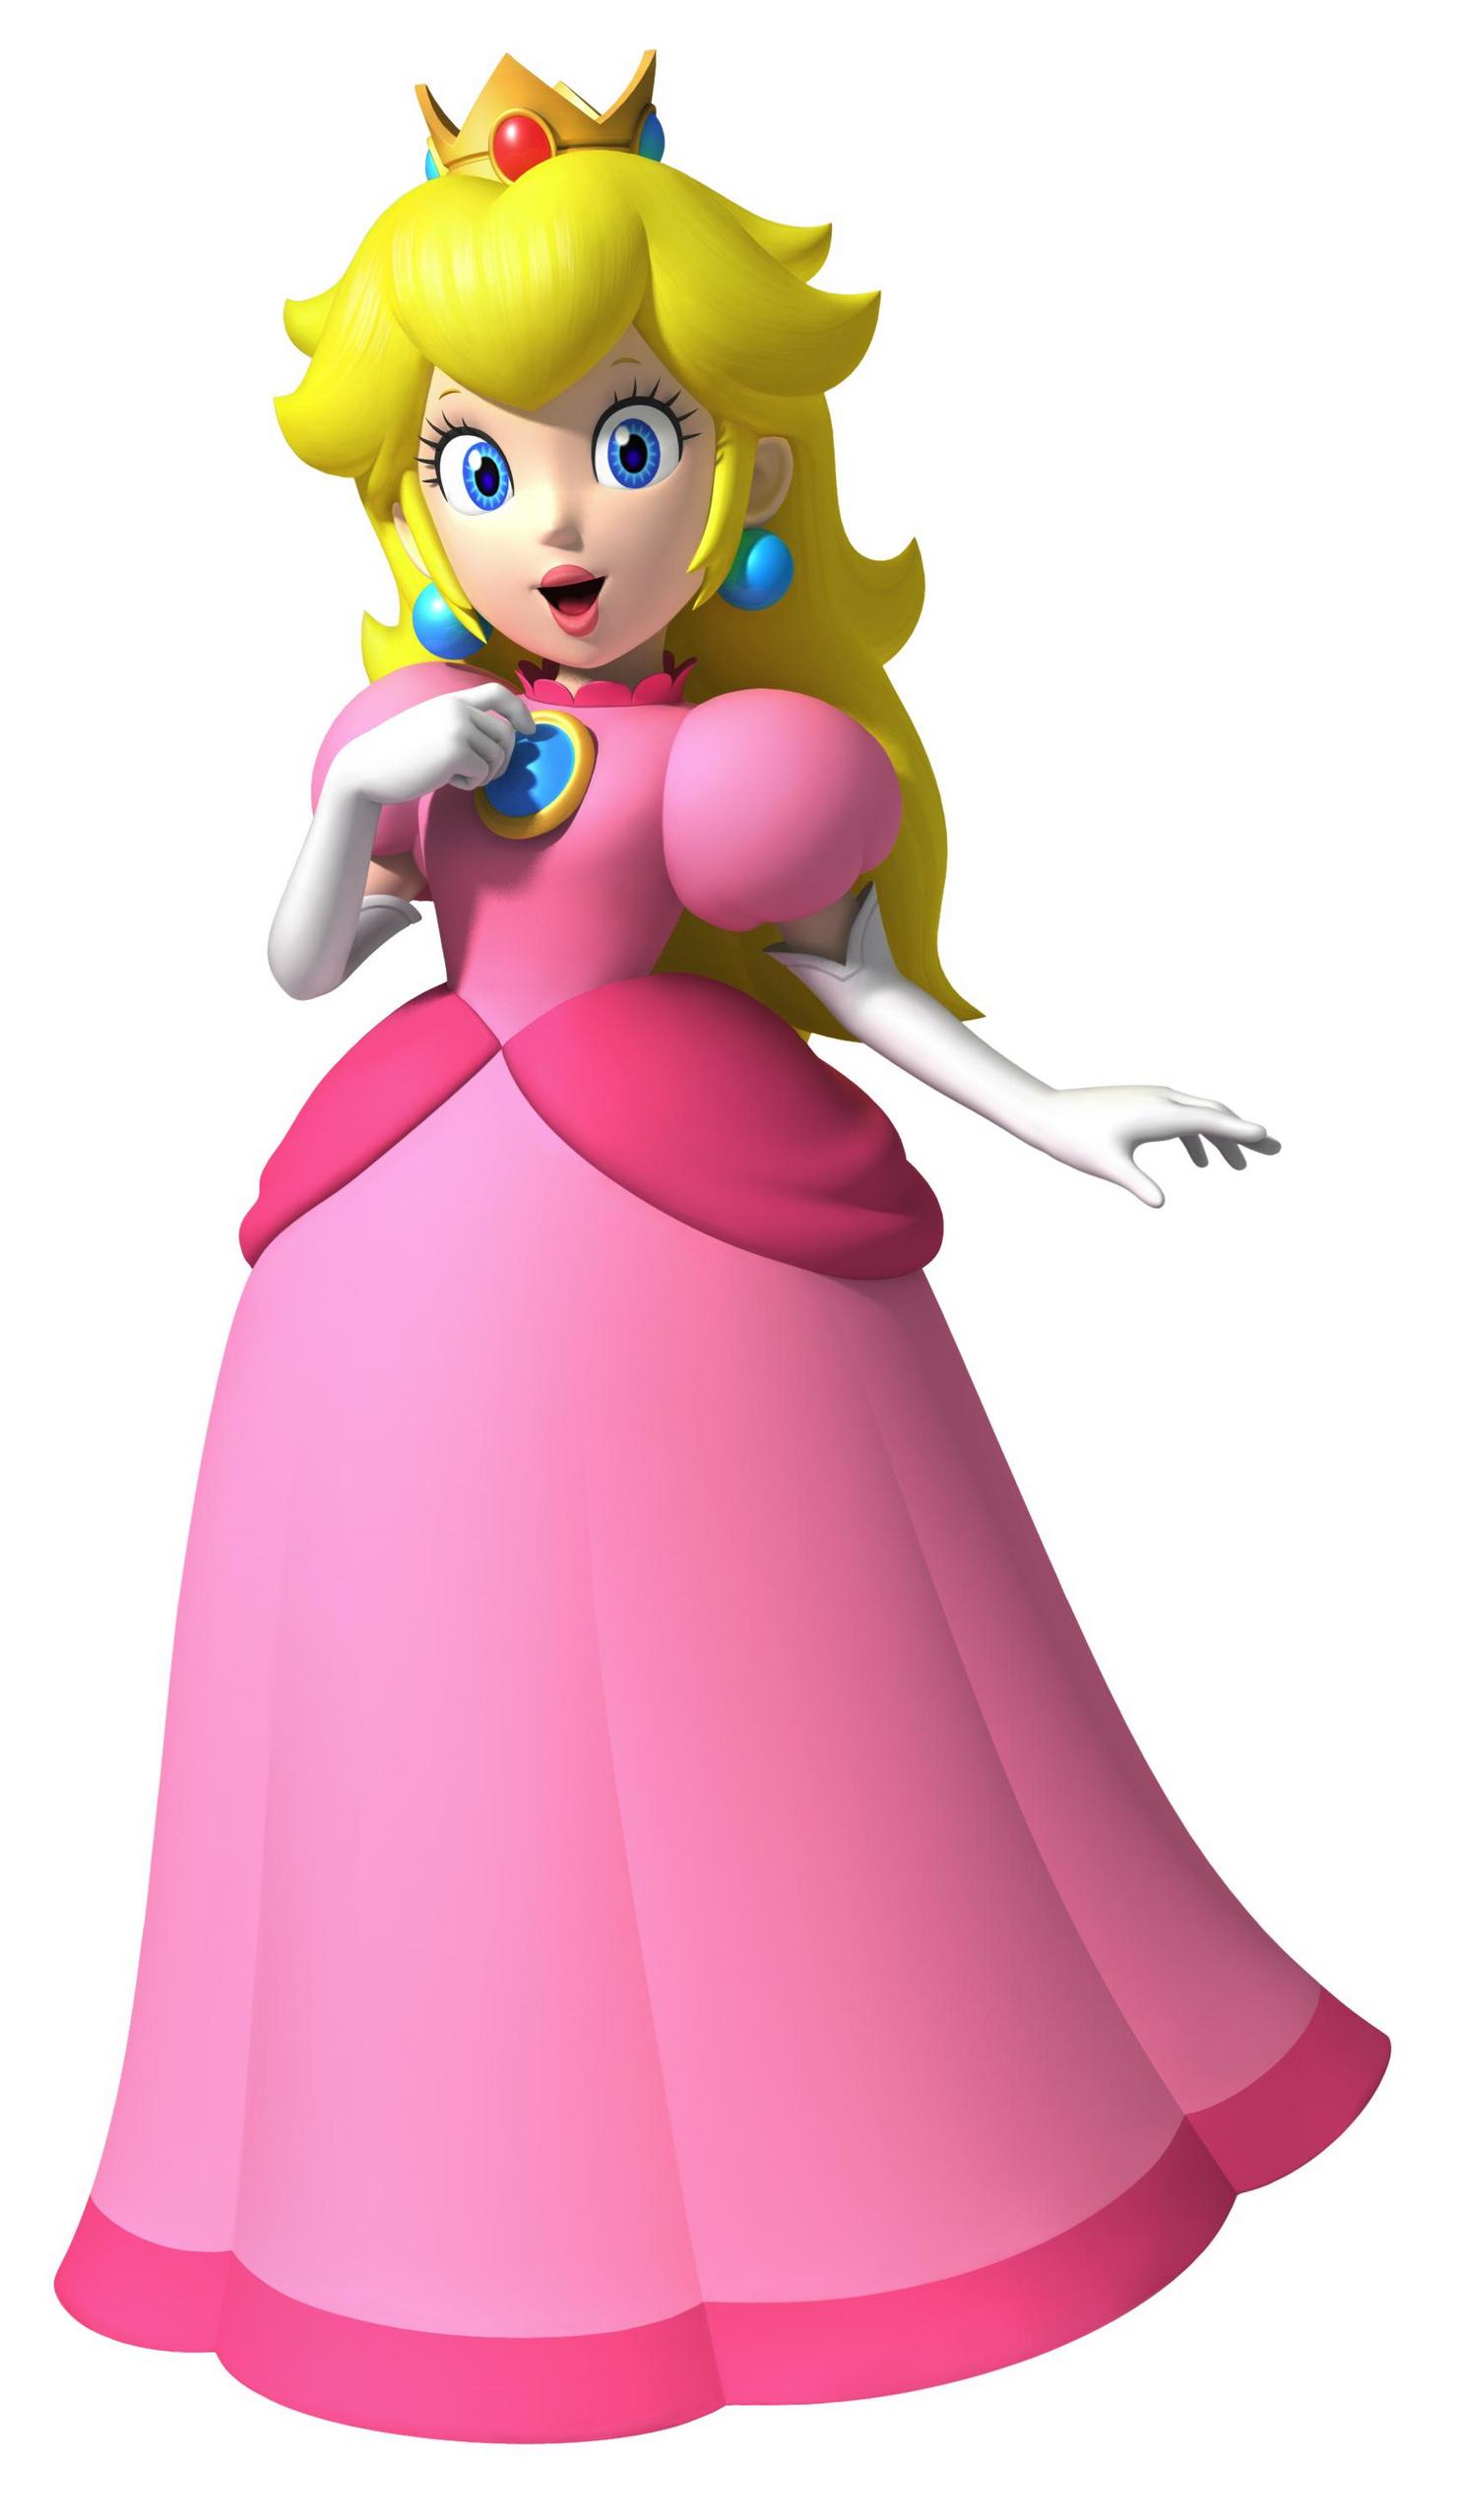 La Princesa De Mario Bross Pictures To Pin On Pinterest